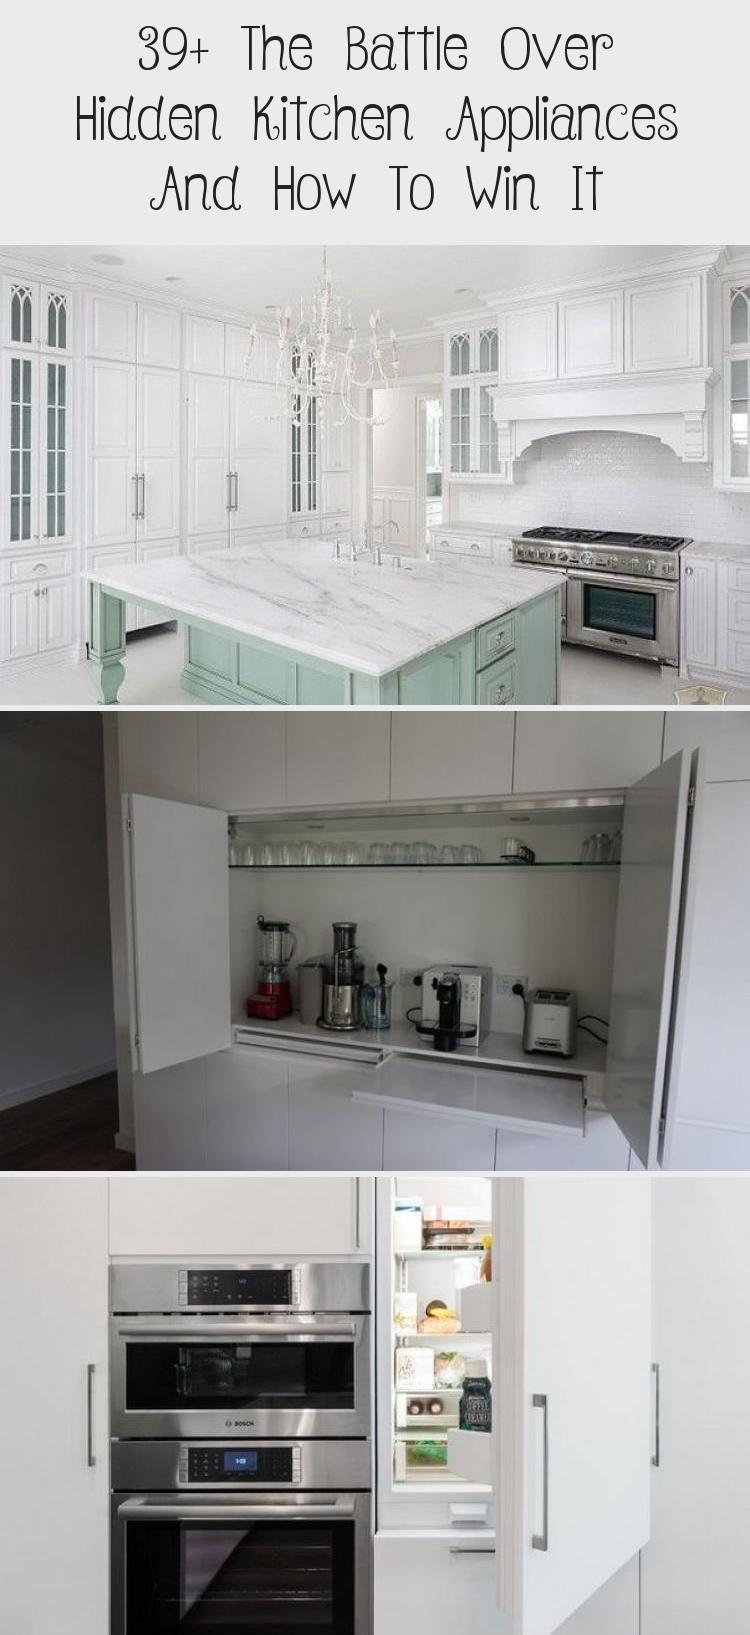 Good Screen Hidden Kitchen Appliances Concepts In 2020 Hidden Kitchen Cost Of Kitchen Cabinets Kitchen Appliances